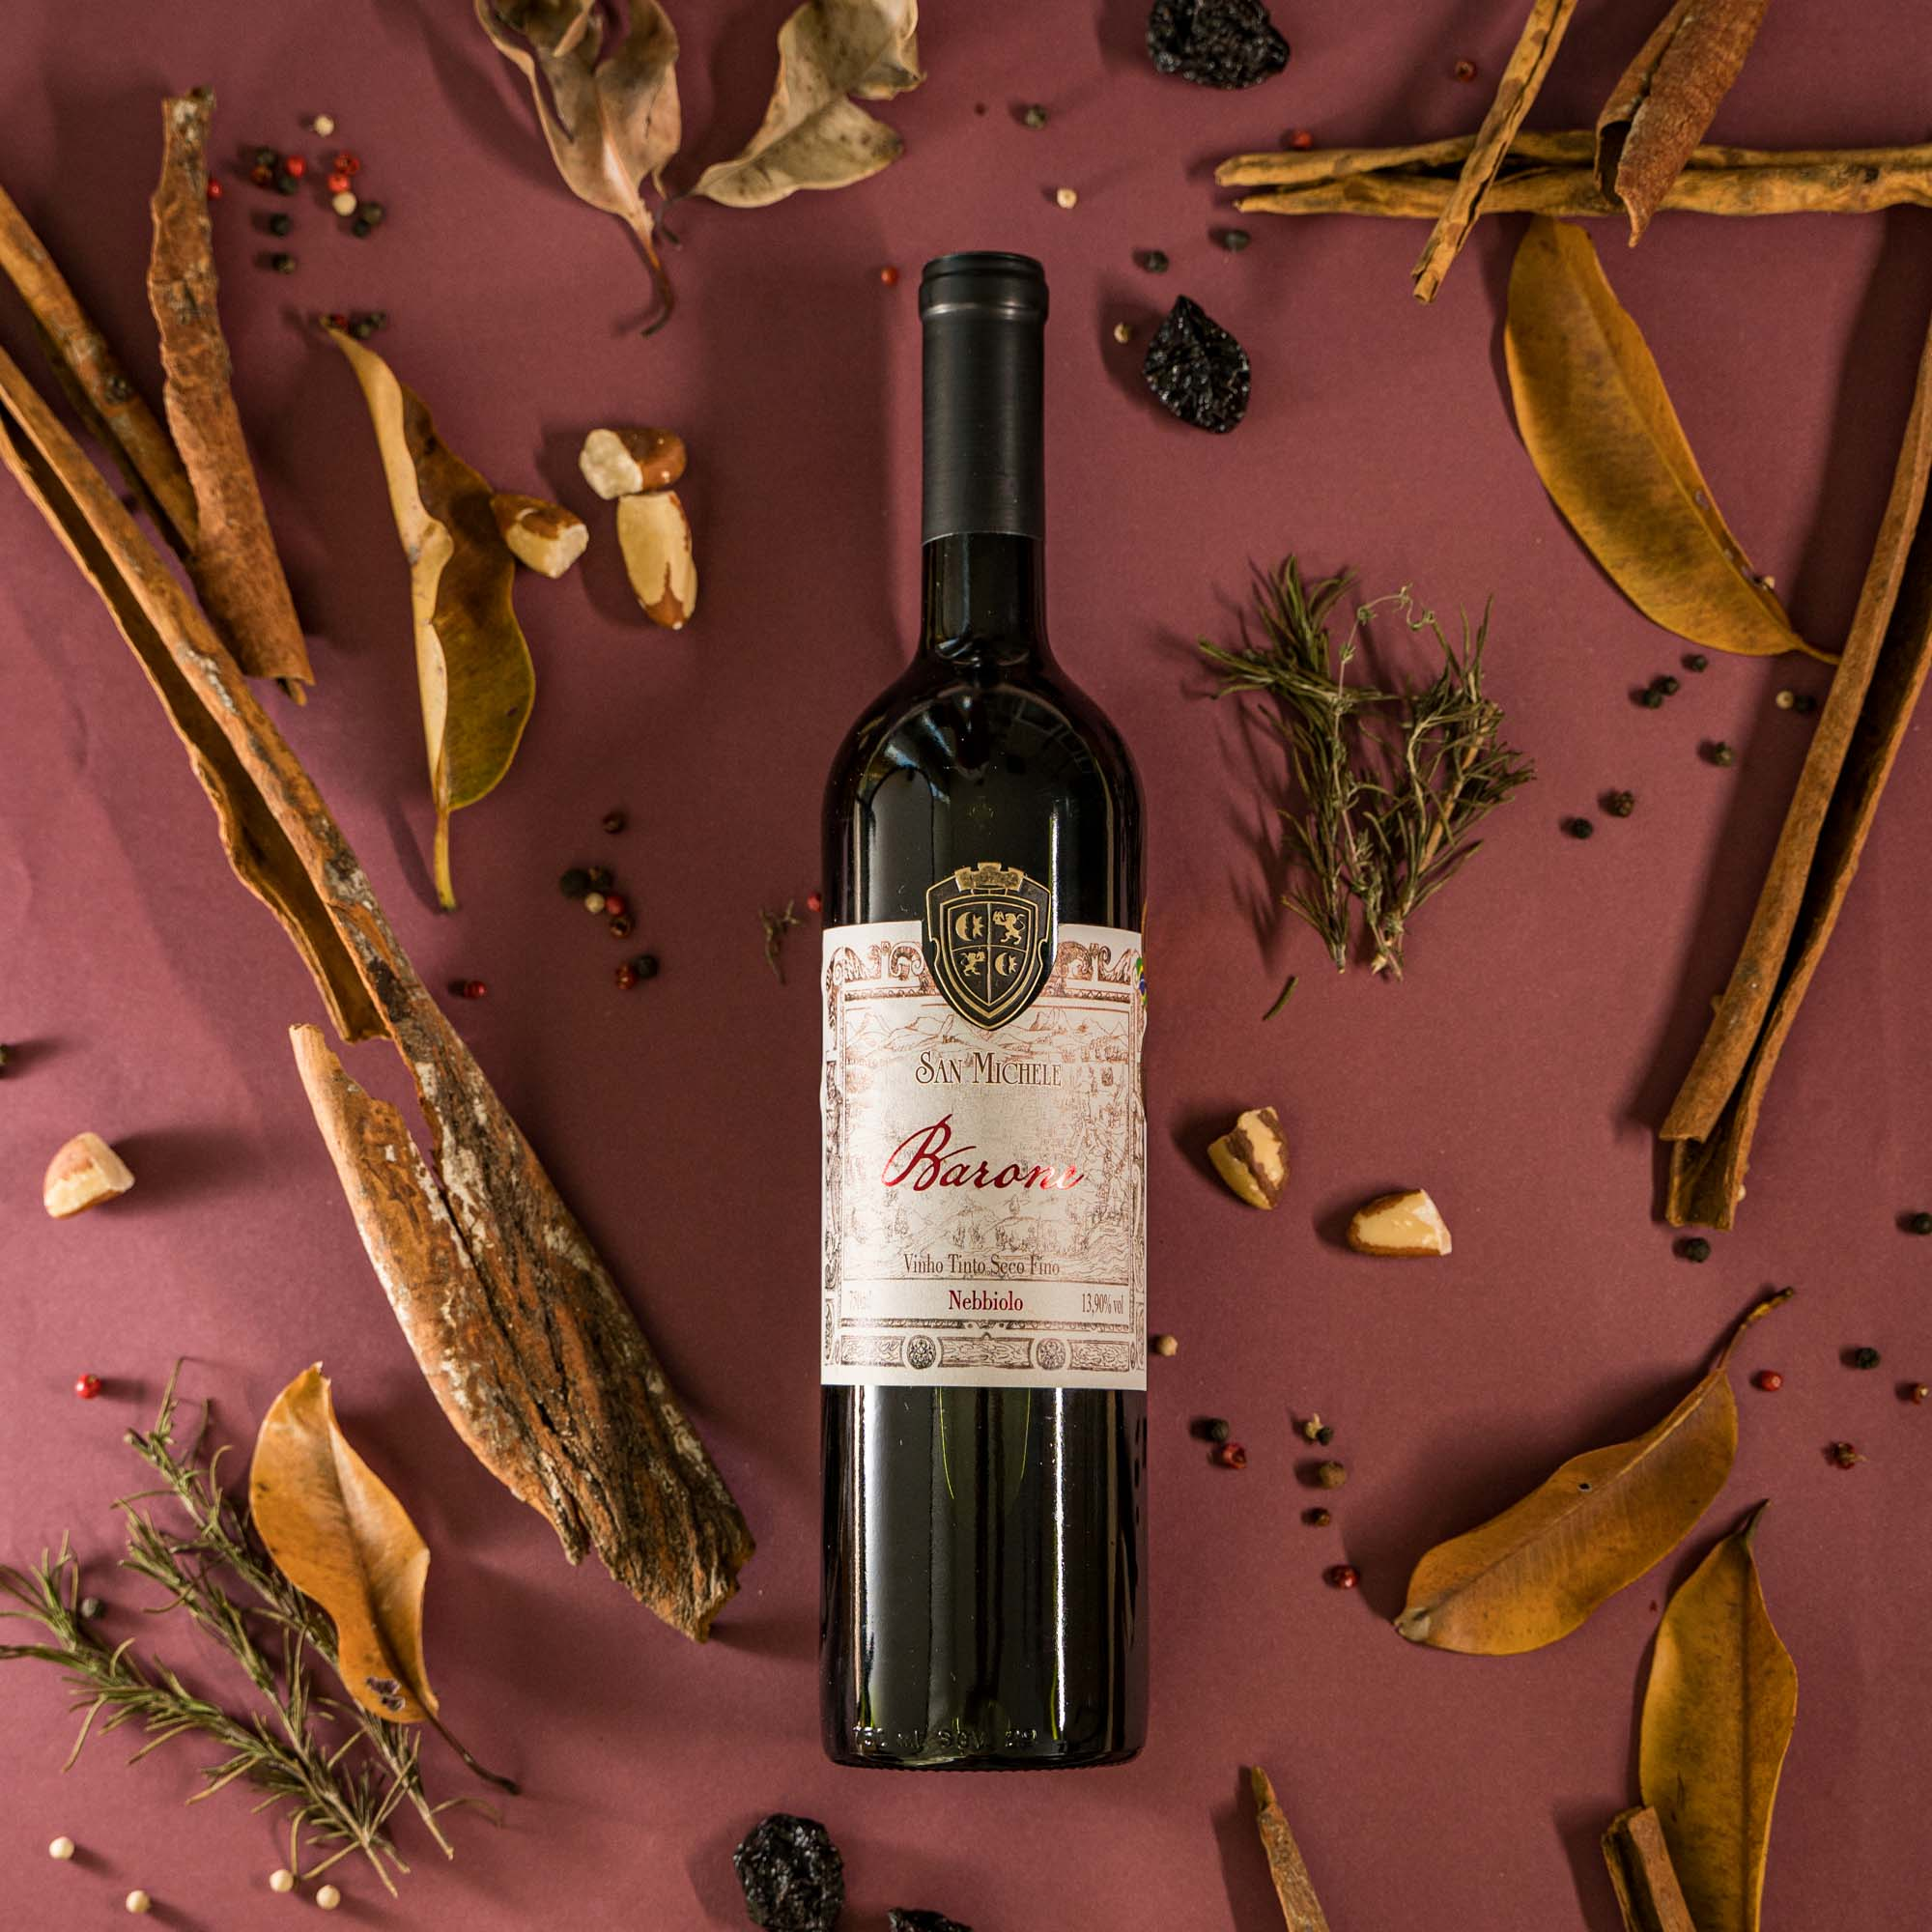 Vinho Tinto Barone - Nebbiolo - Vinícola San Michele